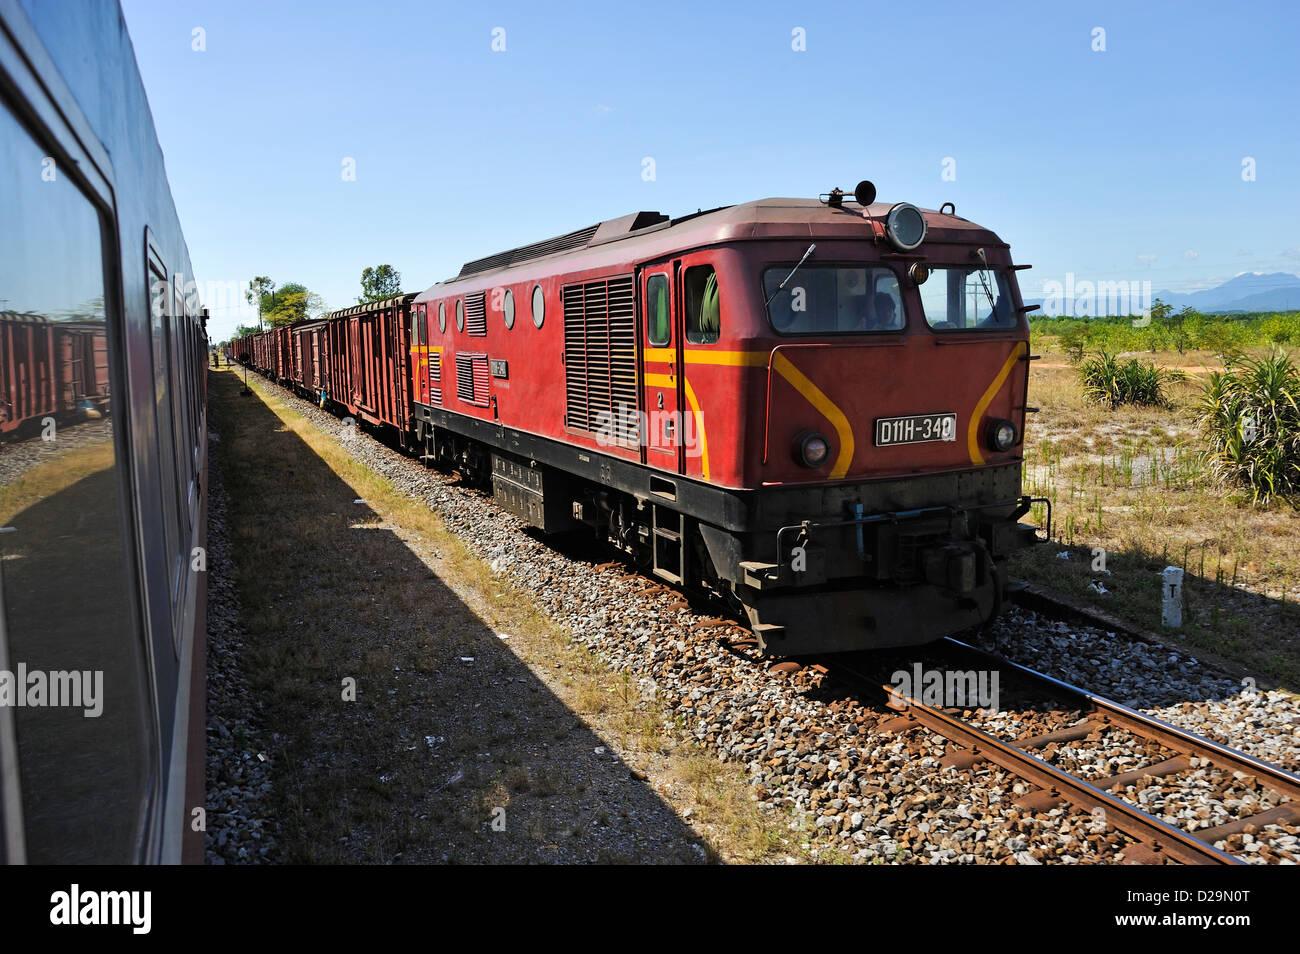 Train journey between Hanoi and Hue, Vietnam - Stock Image